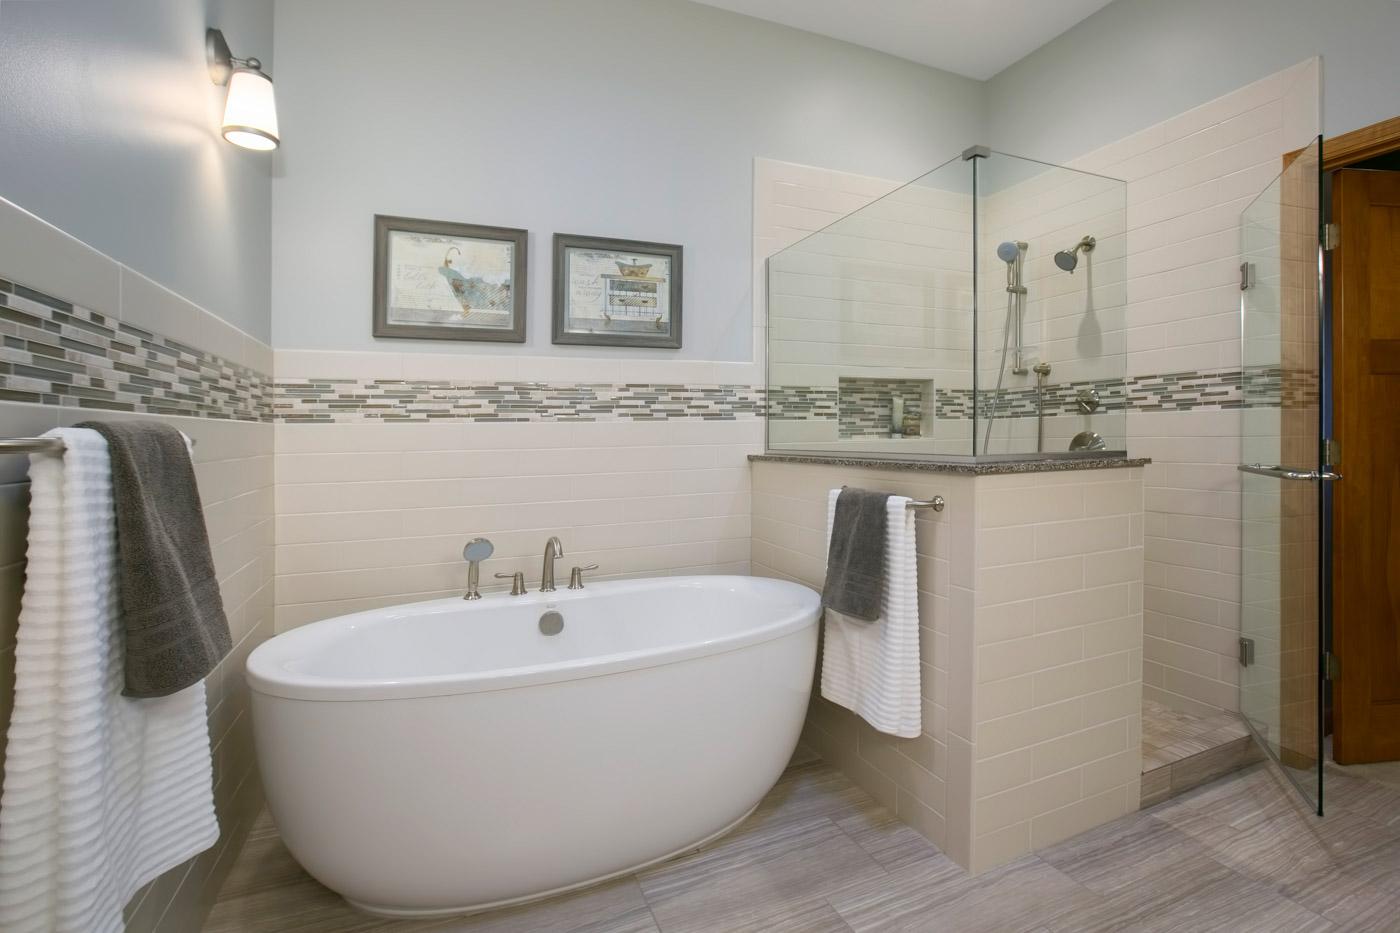 Professional Bathroom Remodeling Services James Barton DesignBuild - Bathroom remodel apple valley mn